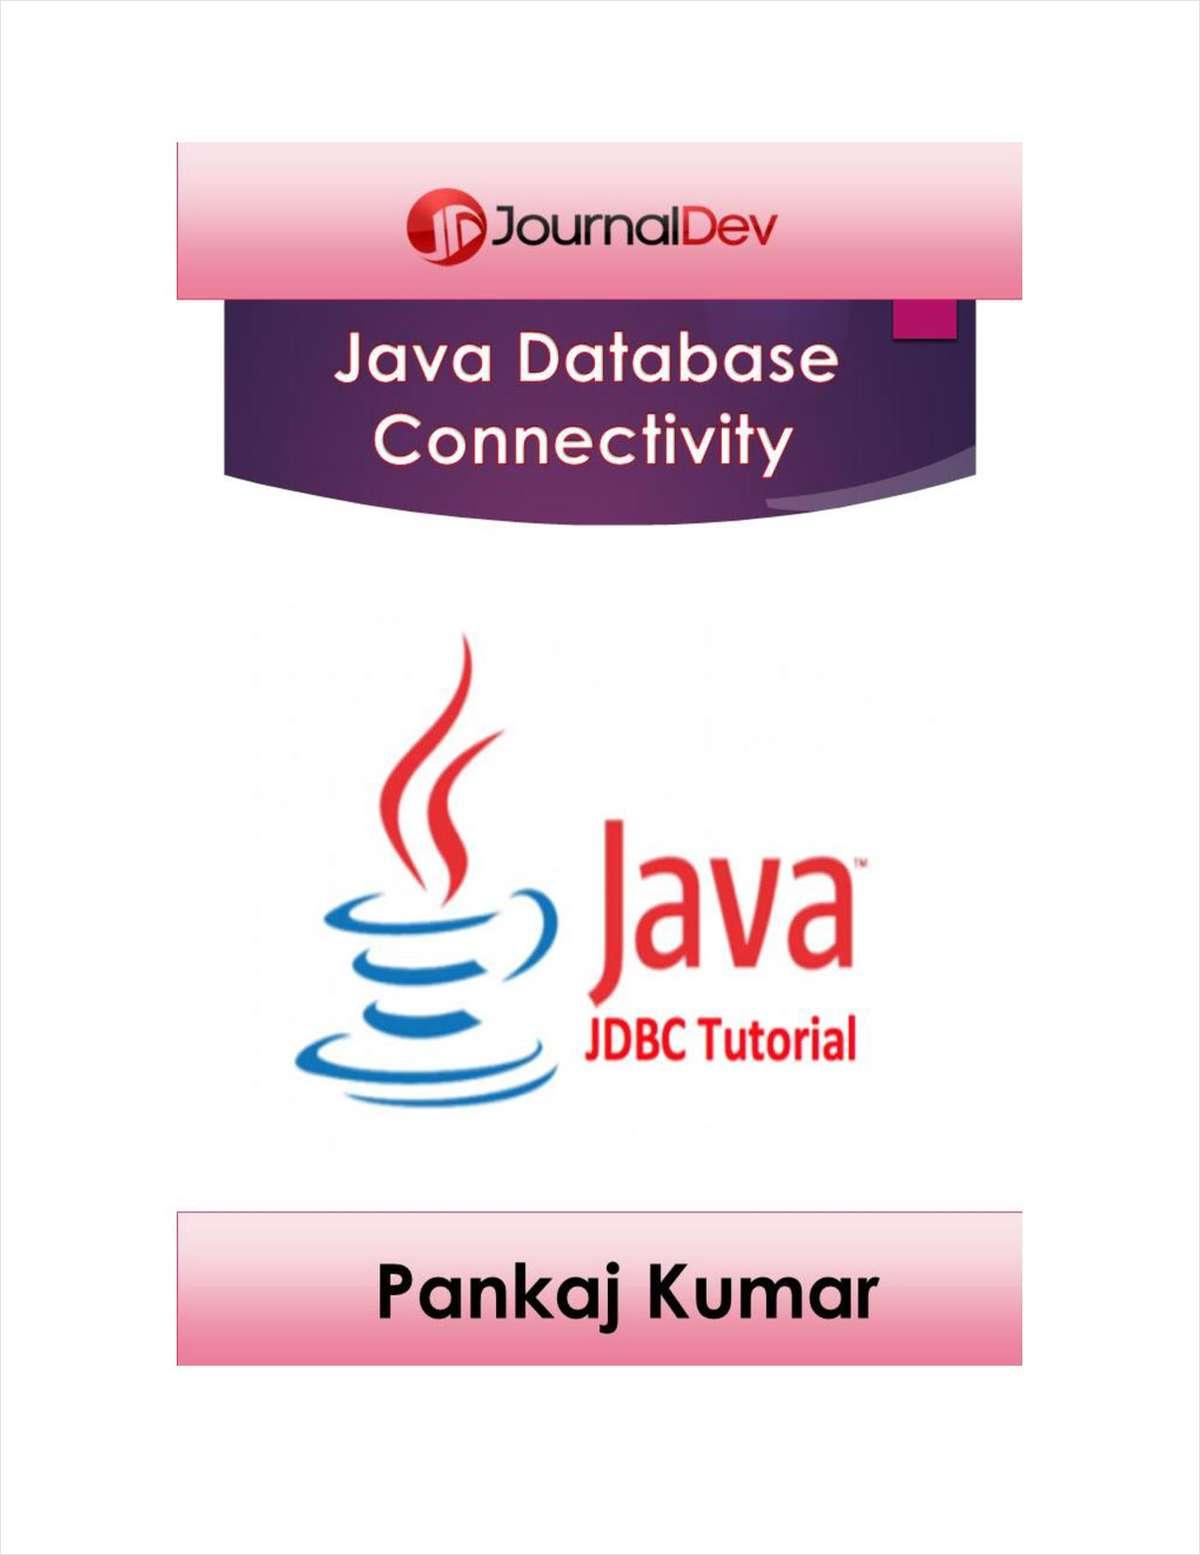 Java Database Connectivity (JDBC) Tutorial